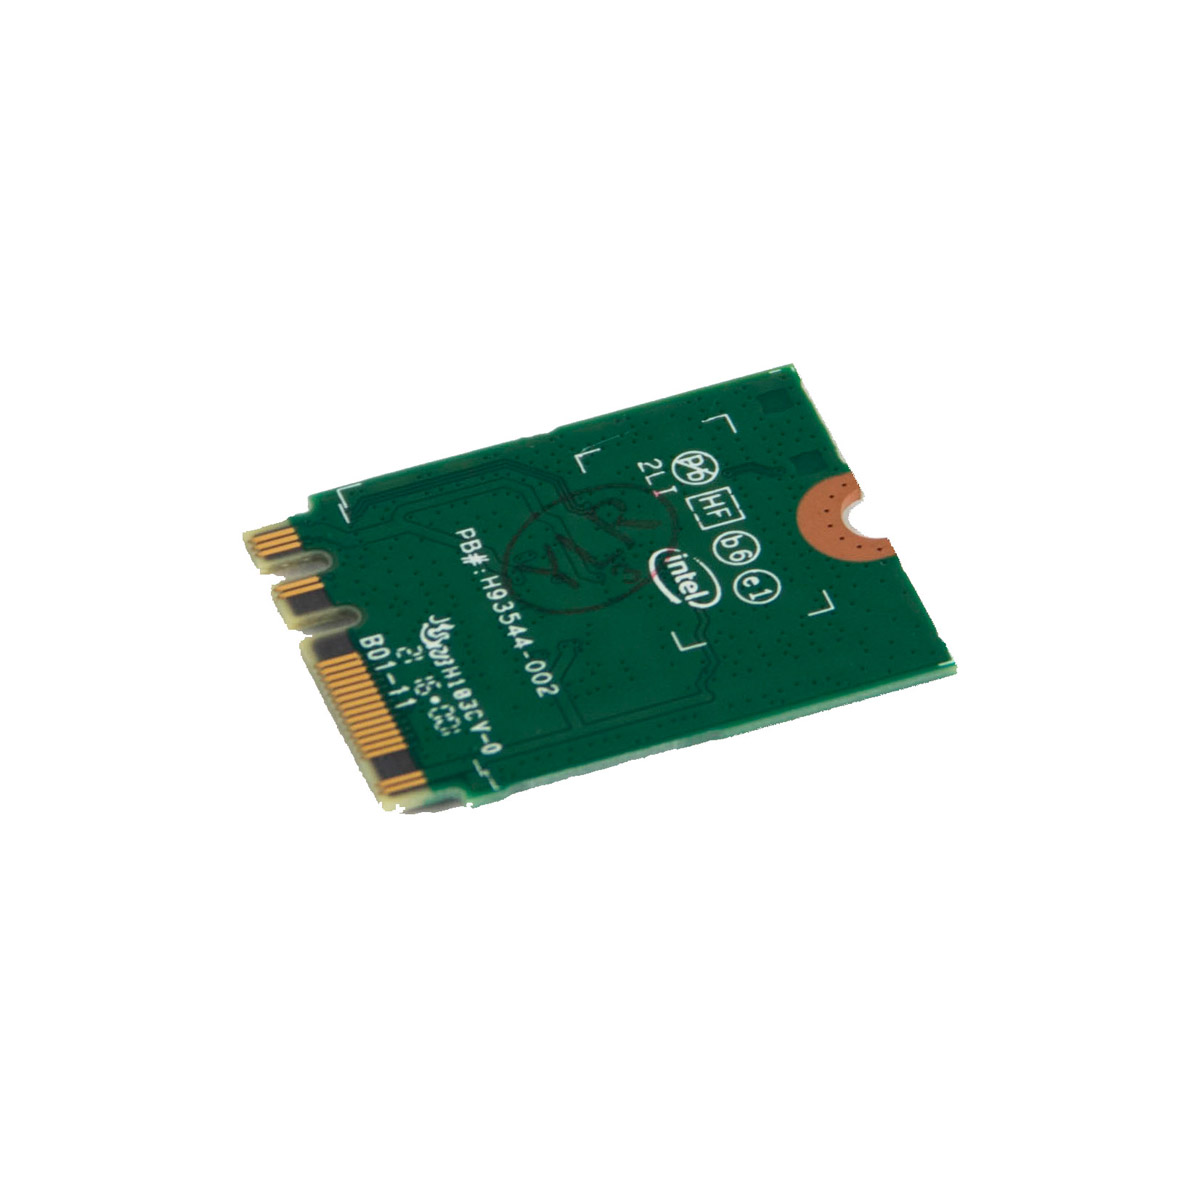 Moduł Wifi Bluetooth Lenovo Thinkpad T470s 8265ngw 01ax704